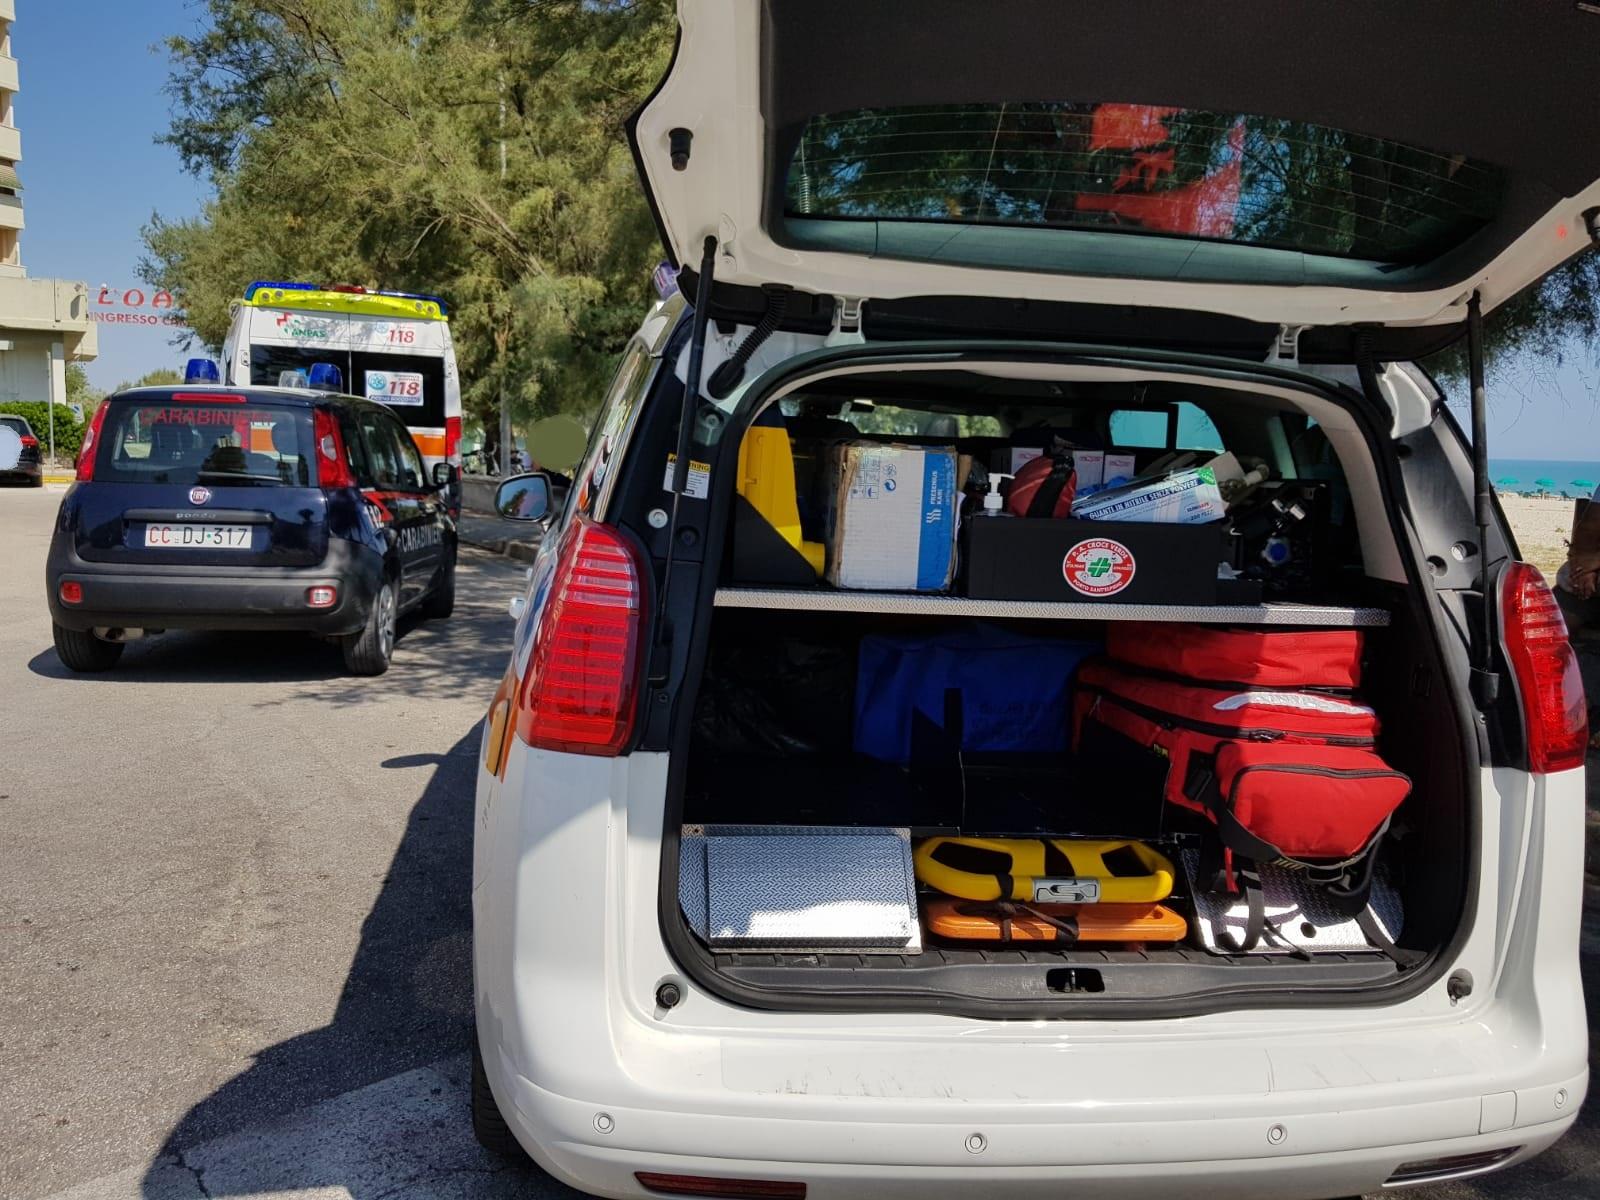 carabinieri-ambulanza-3-archi-118-3